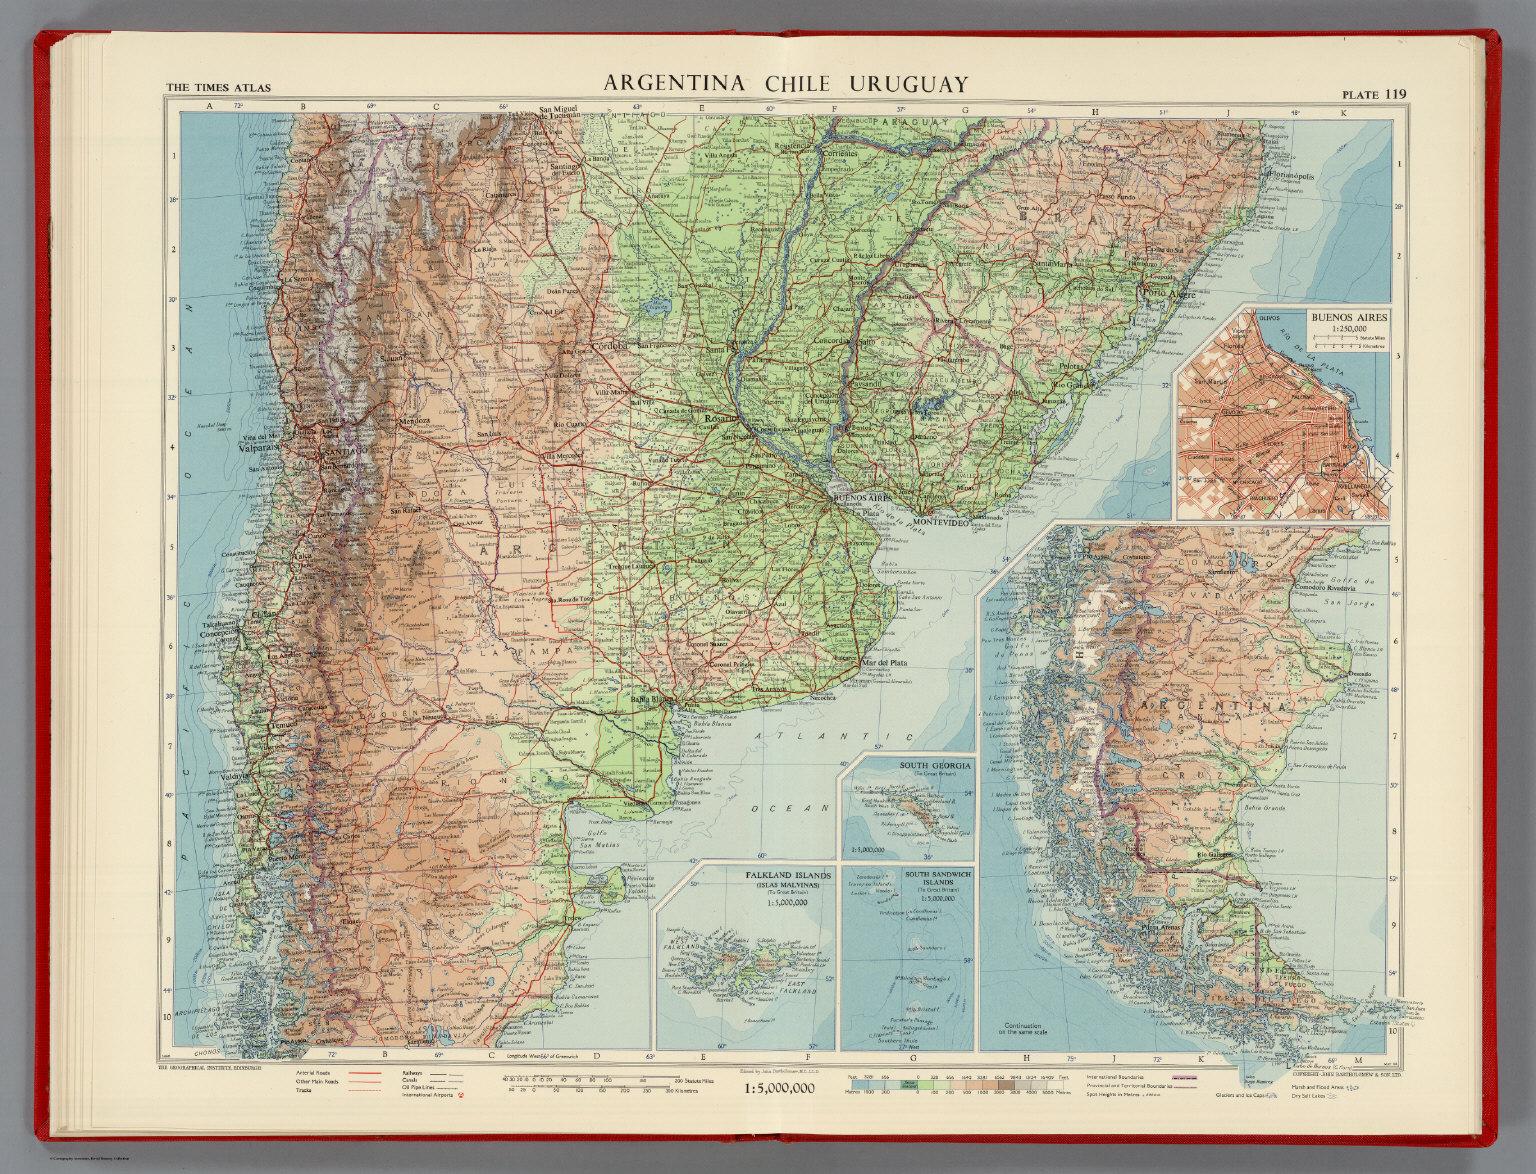 Argentina, Chile, Uruguay, Plate 119, Vol. V